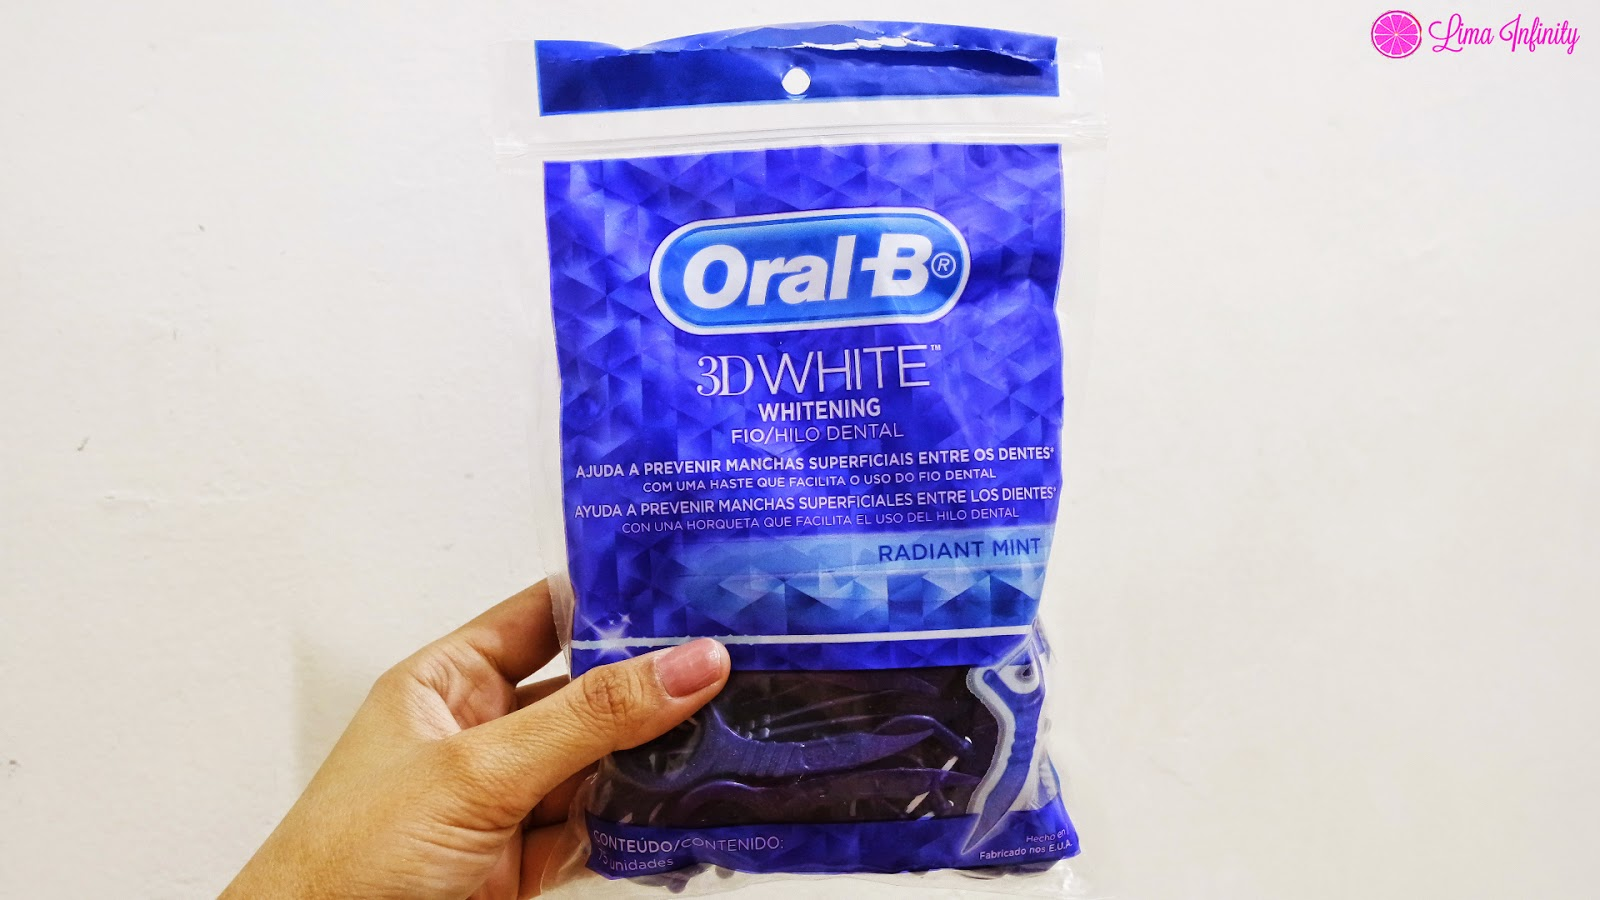 ORAL B - FIO DENTAL - LIMA INFINITY